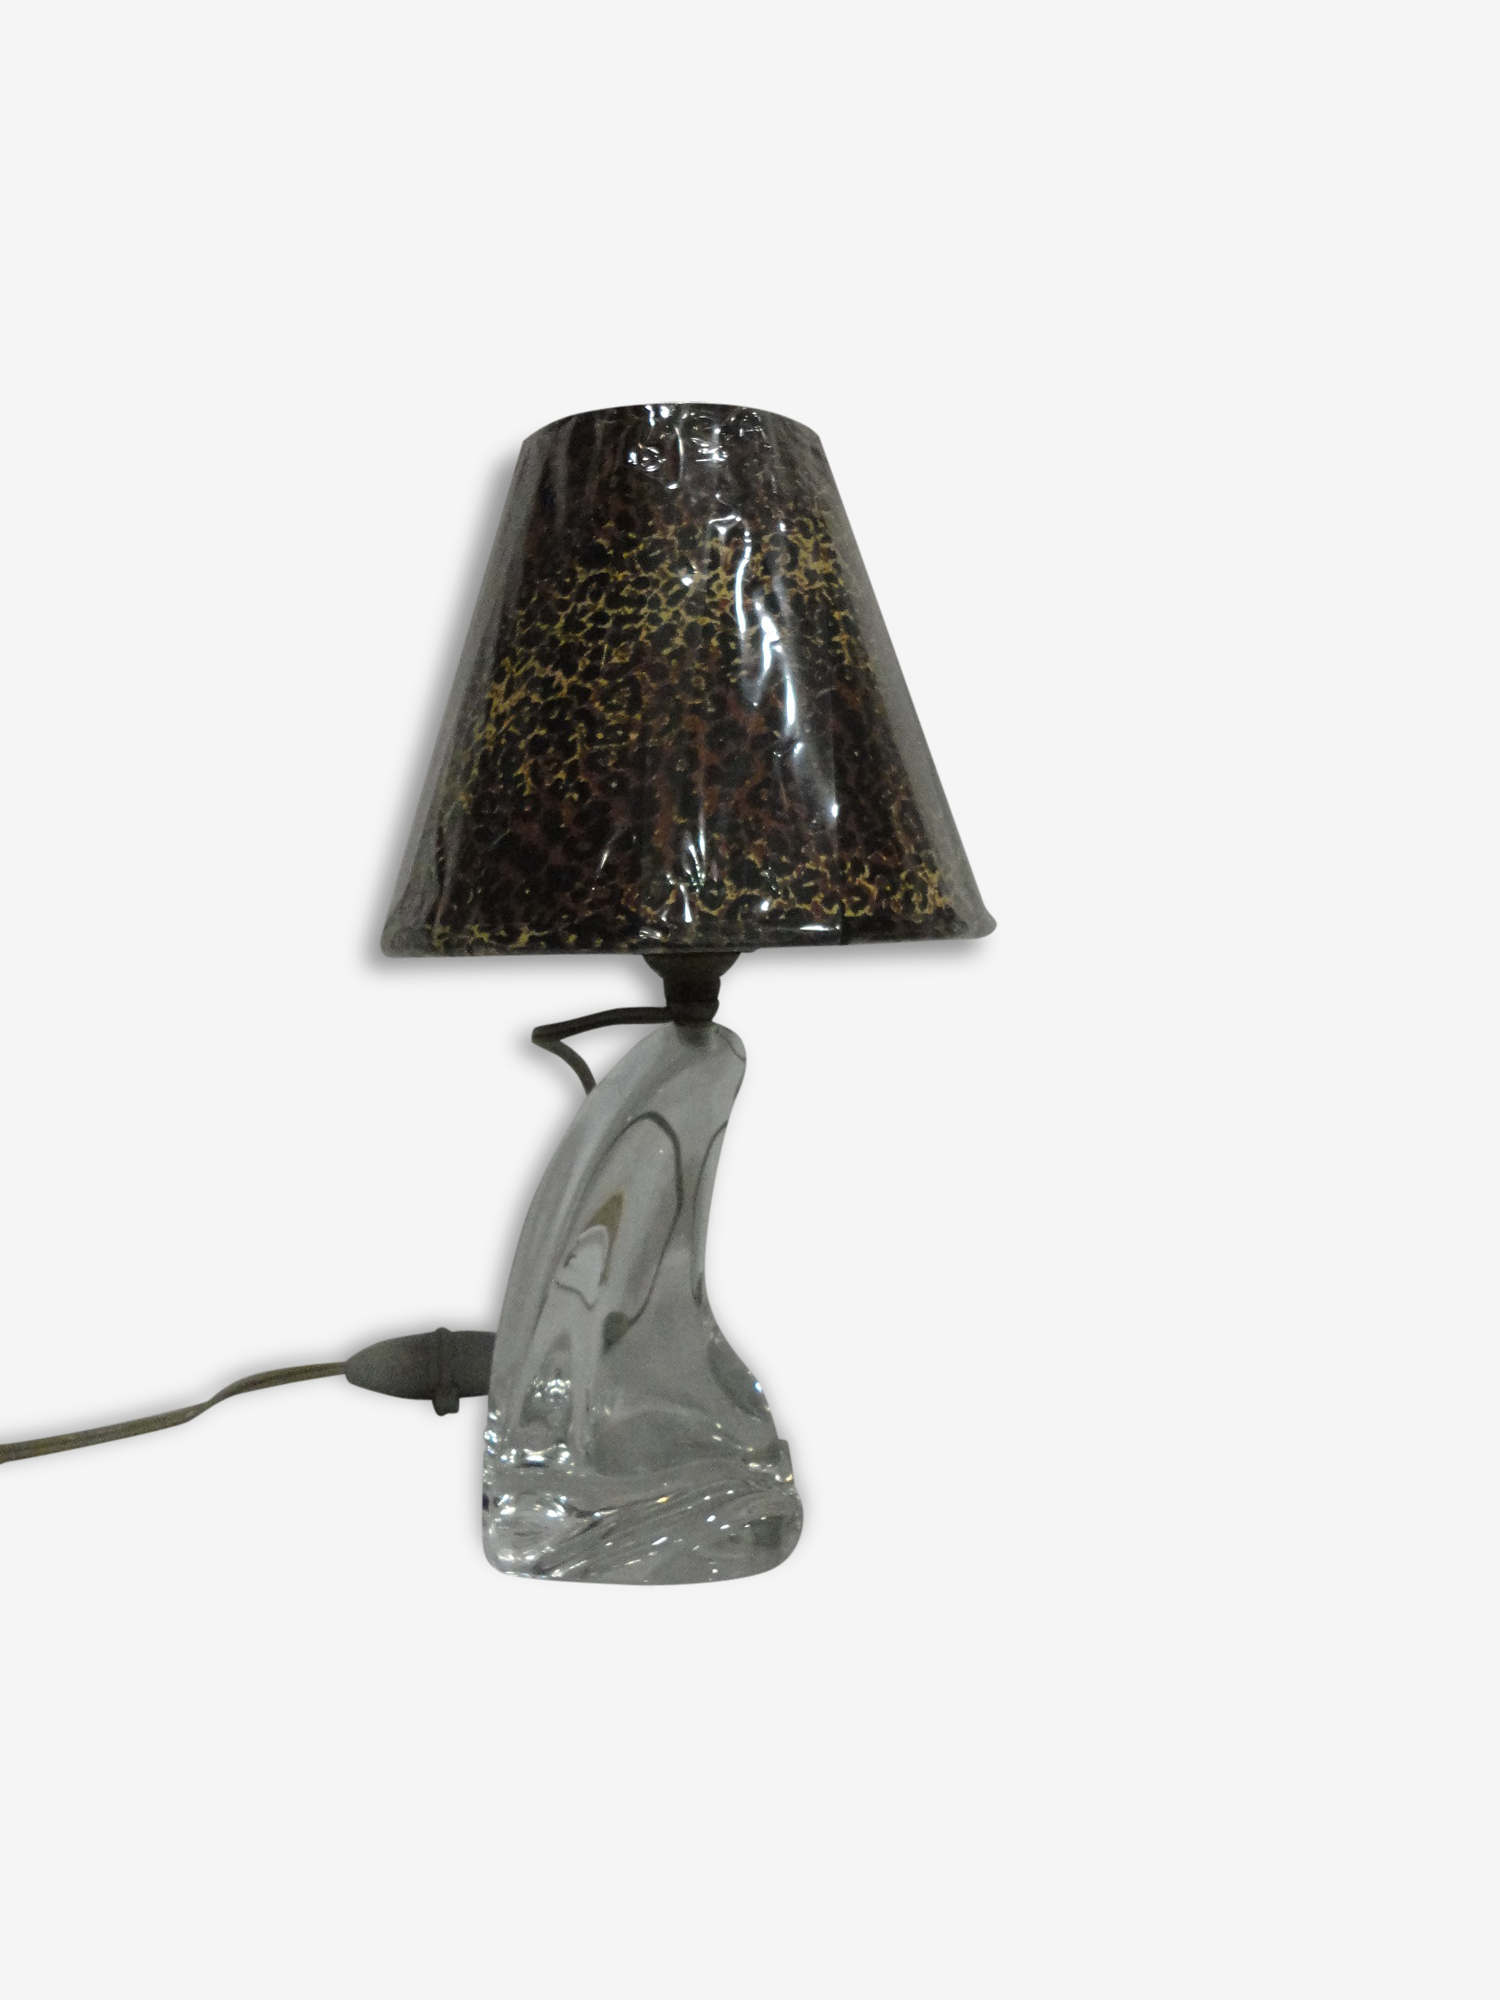 Lampe Cristal De Daum France Glass And Crystal Transparent